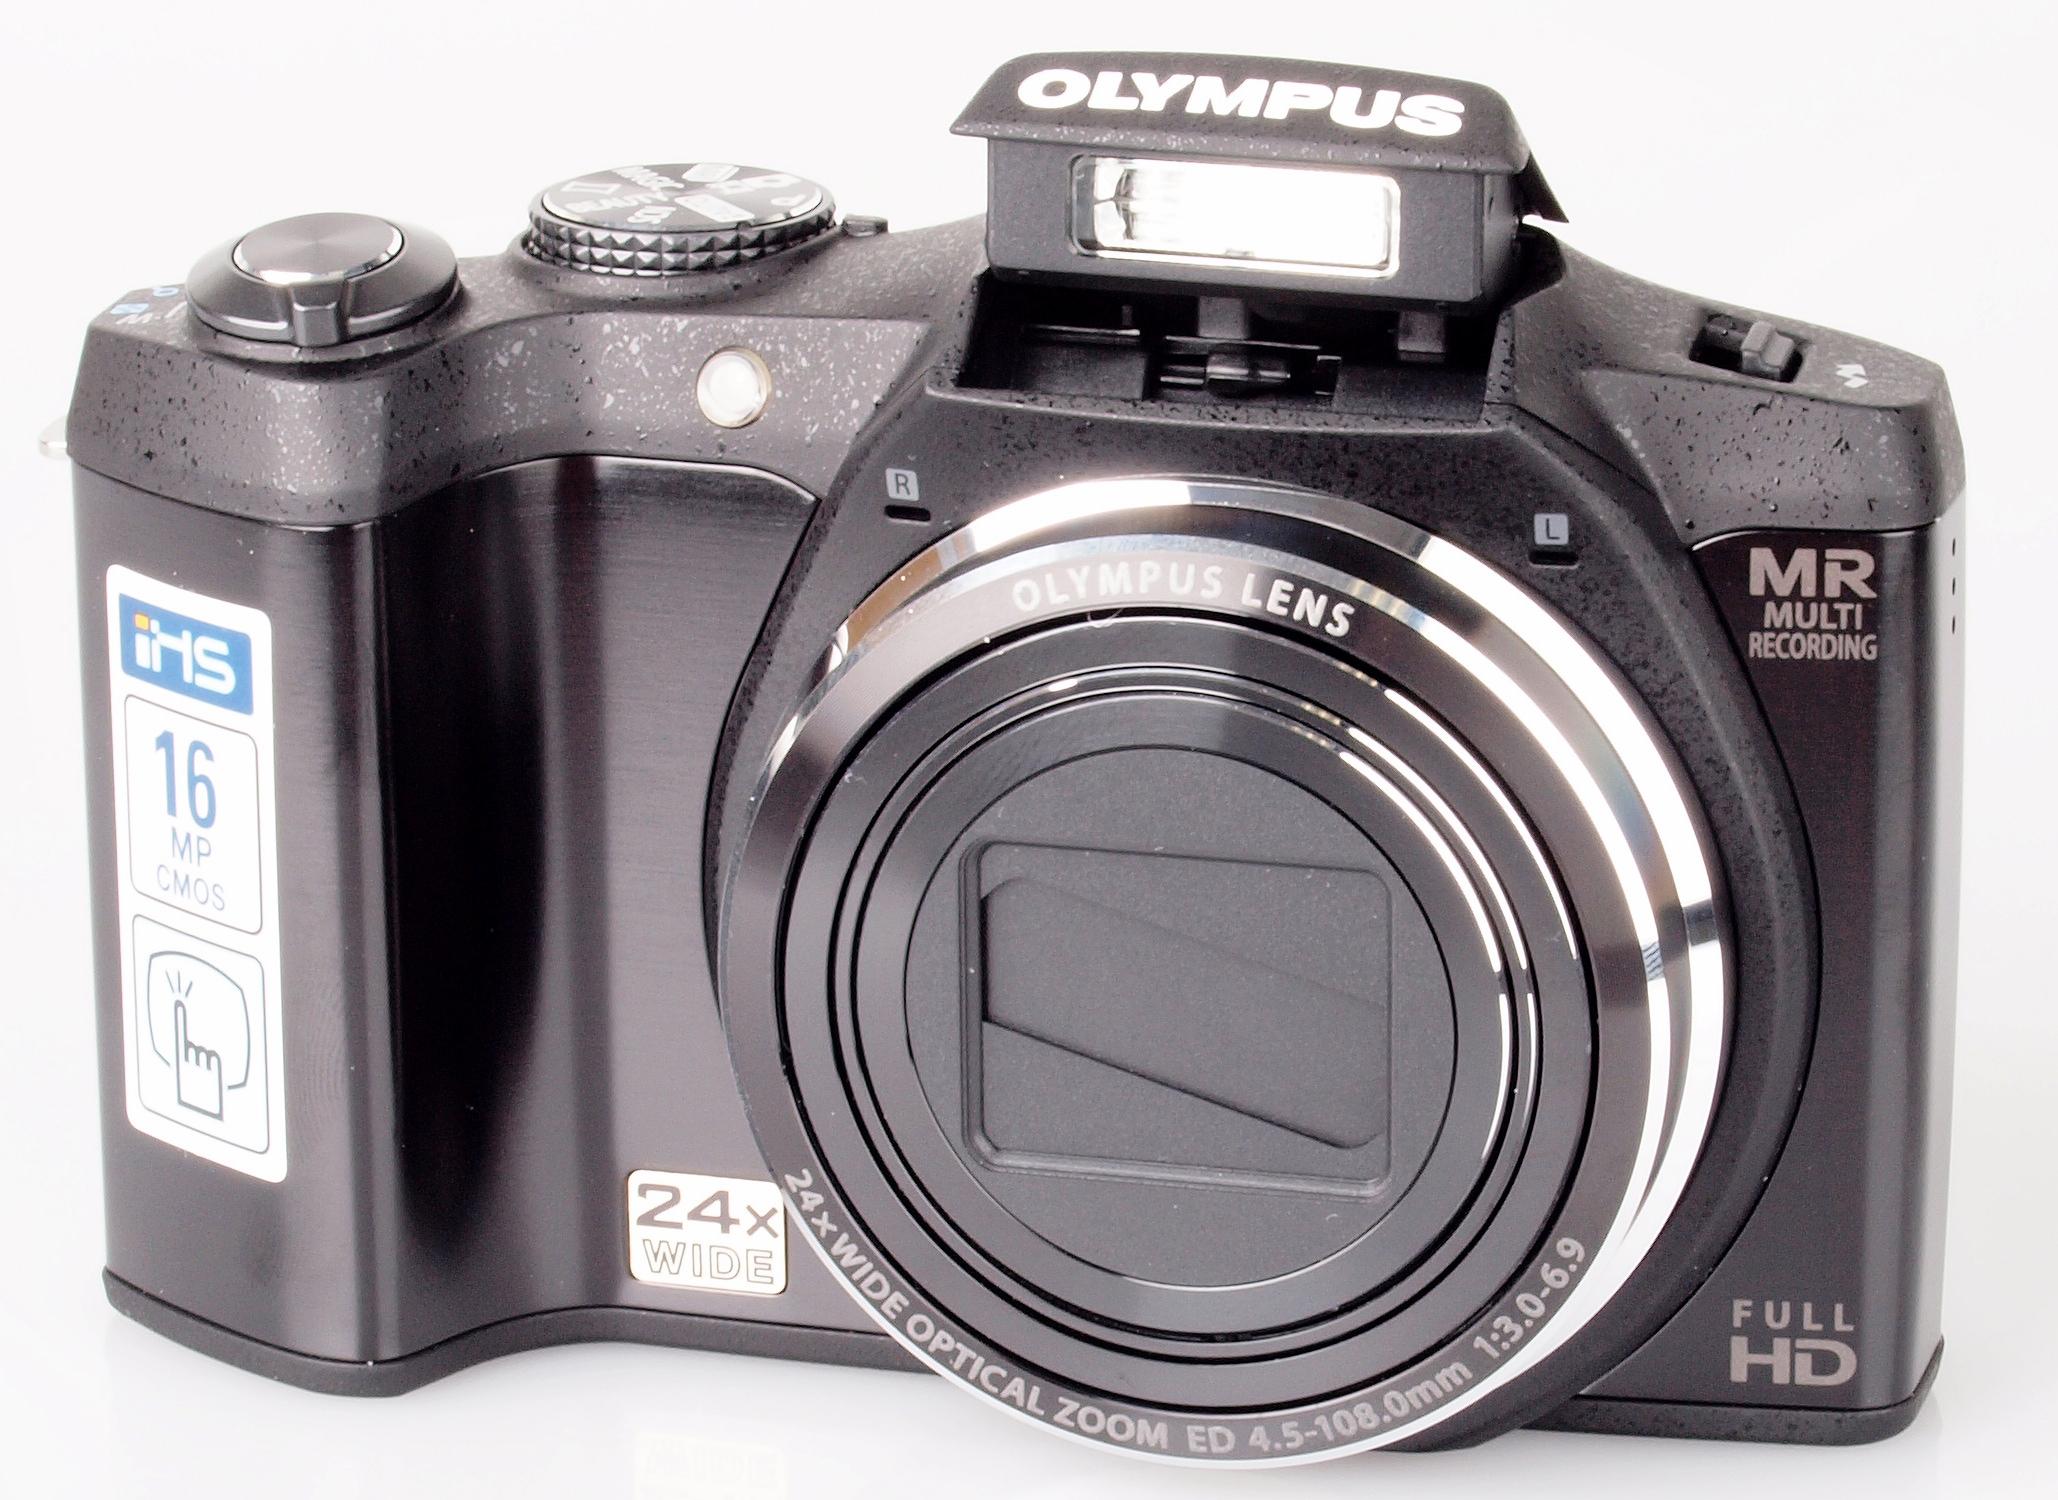 она излюбленная фотоаппарат олимпус фулл нд трижды